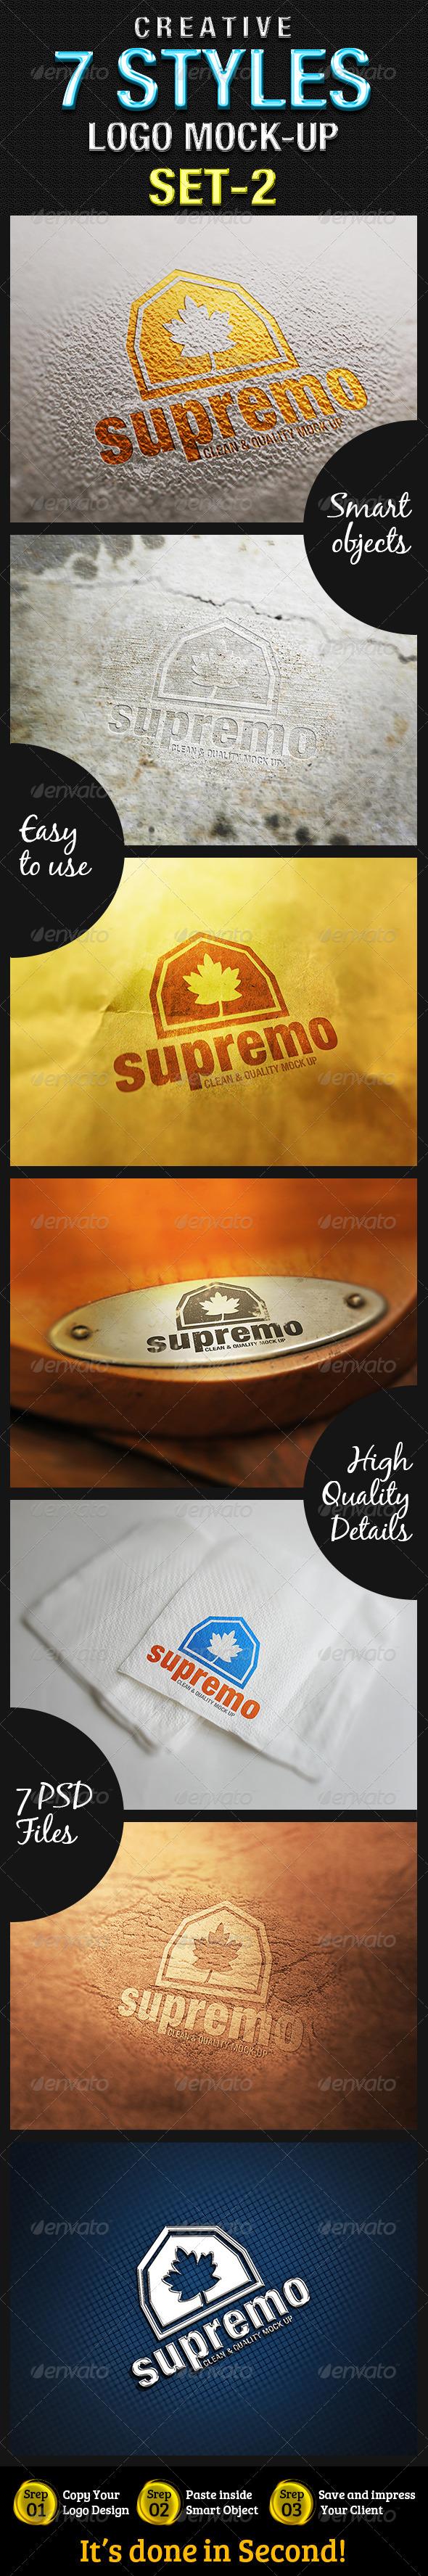 GraphicRiver 7 Styles Creative Logo Mock-Up SET 2 4860071